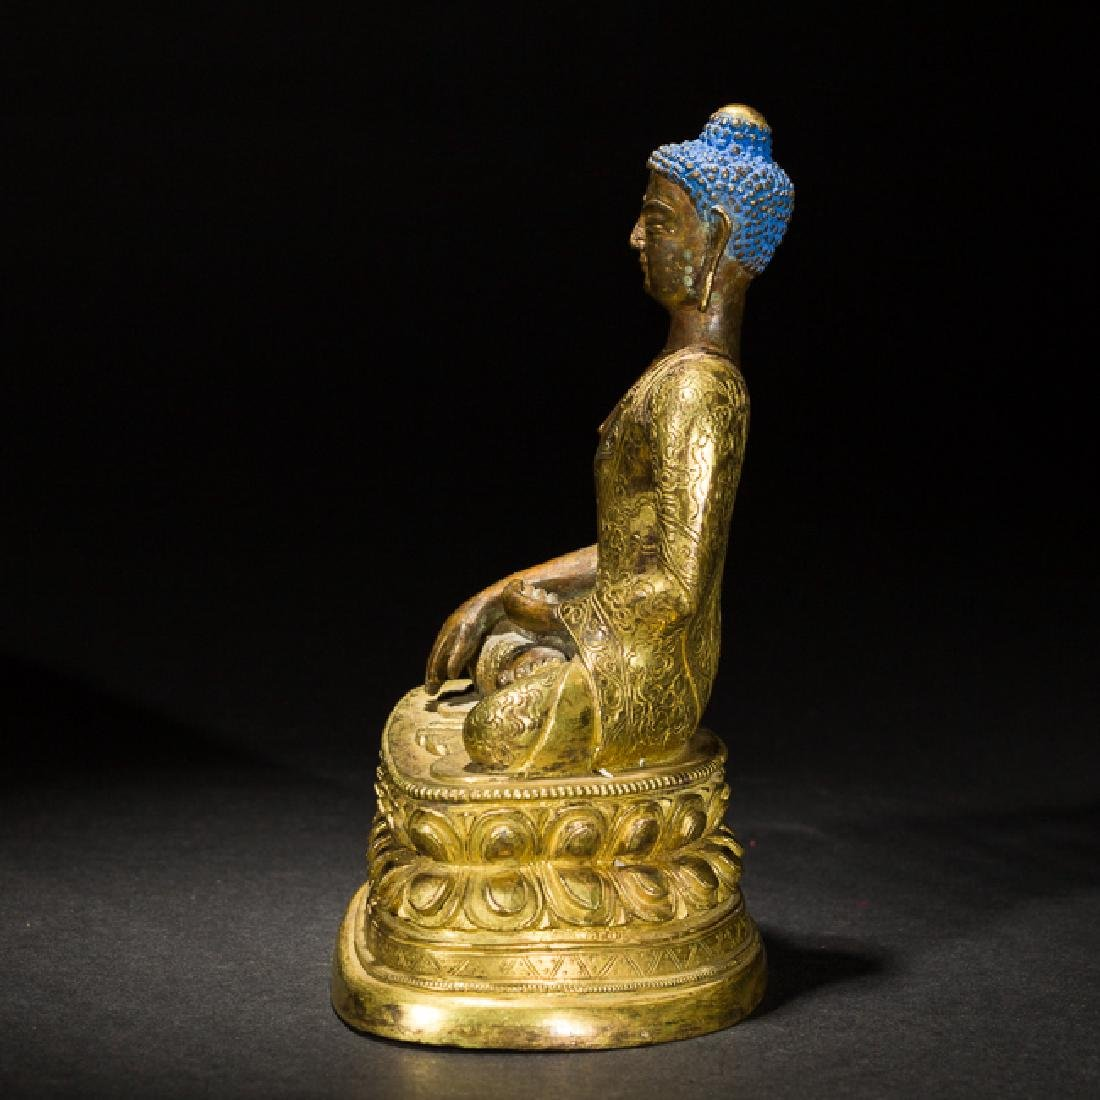 Antique Gilt Bronze Figure of Shakyamuni Buddha, 18th - 2